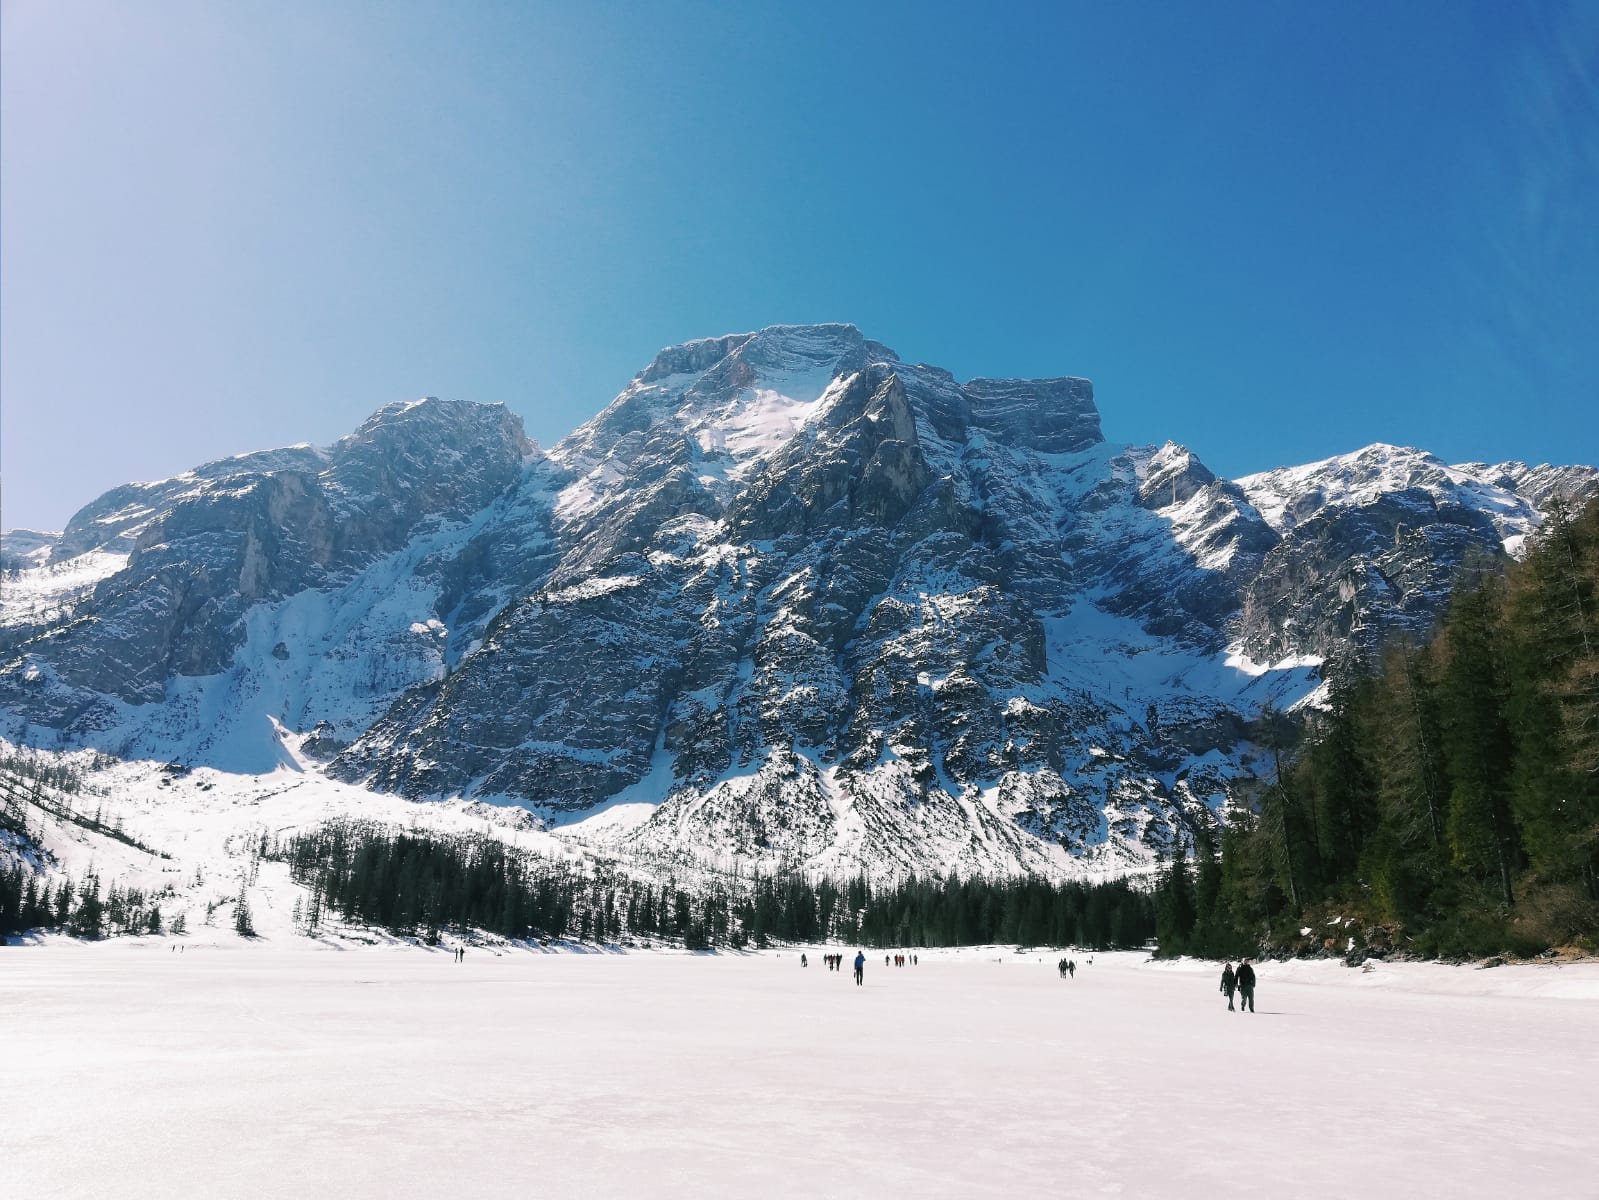 lago di braies ghiacciato